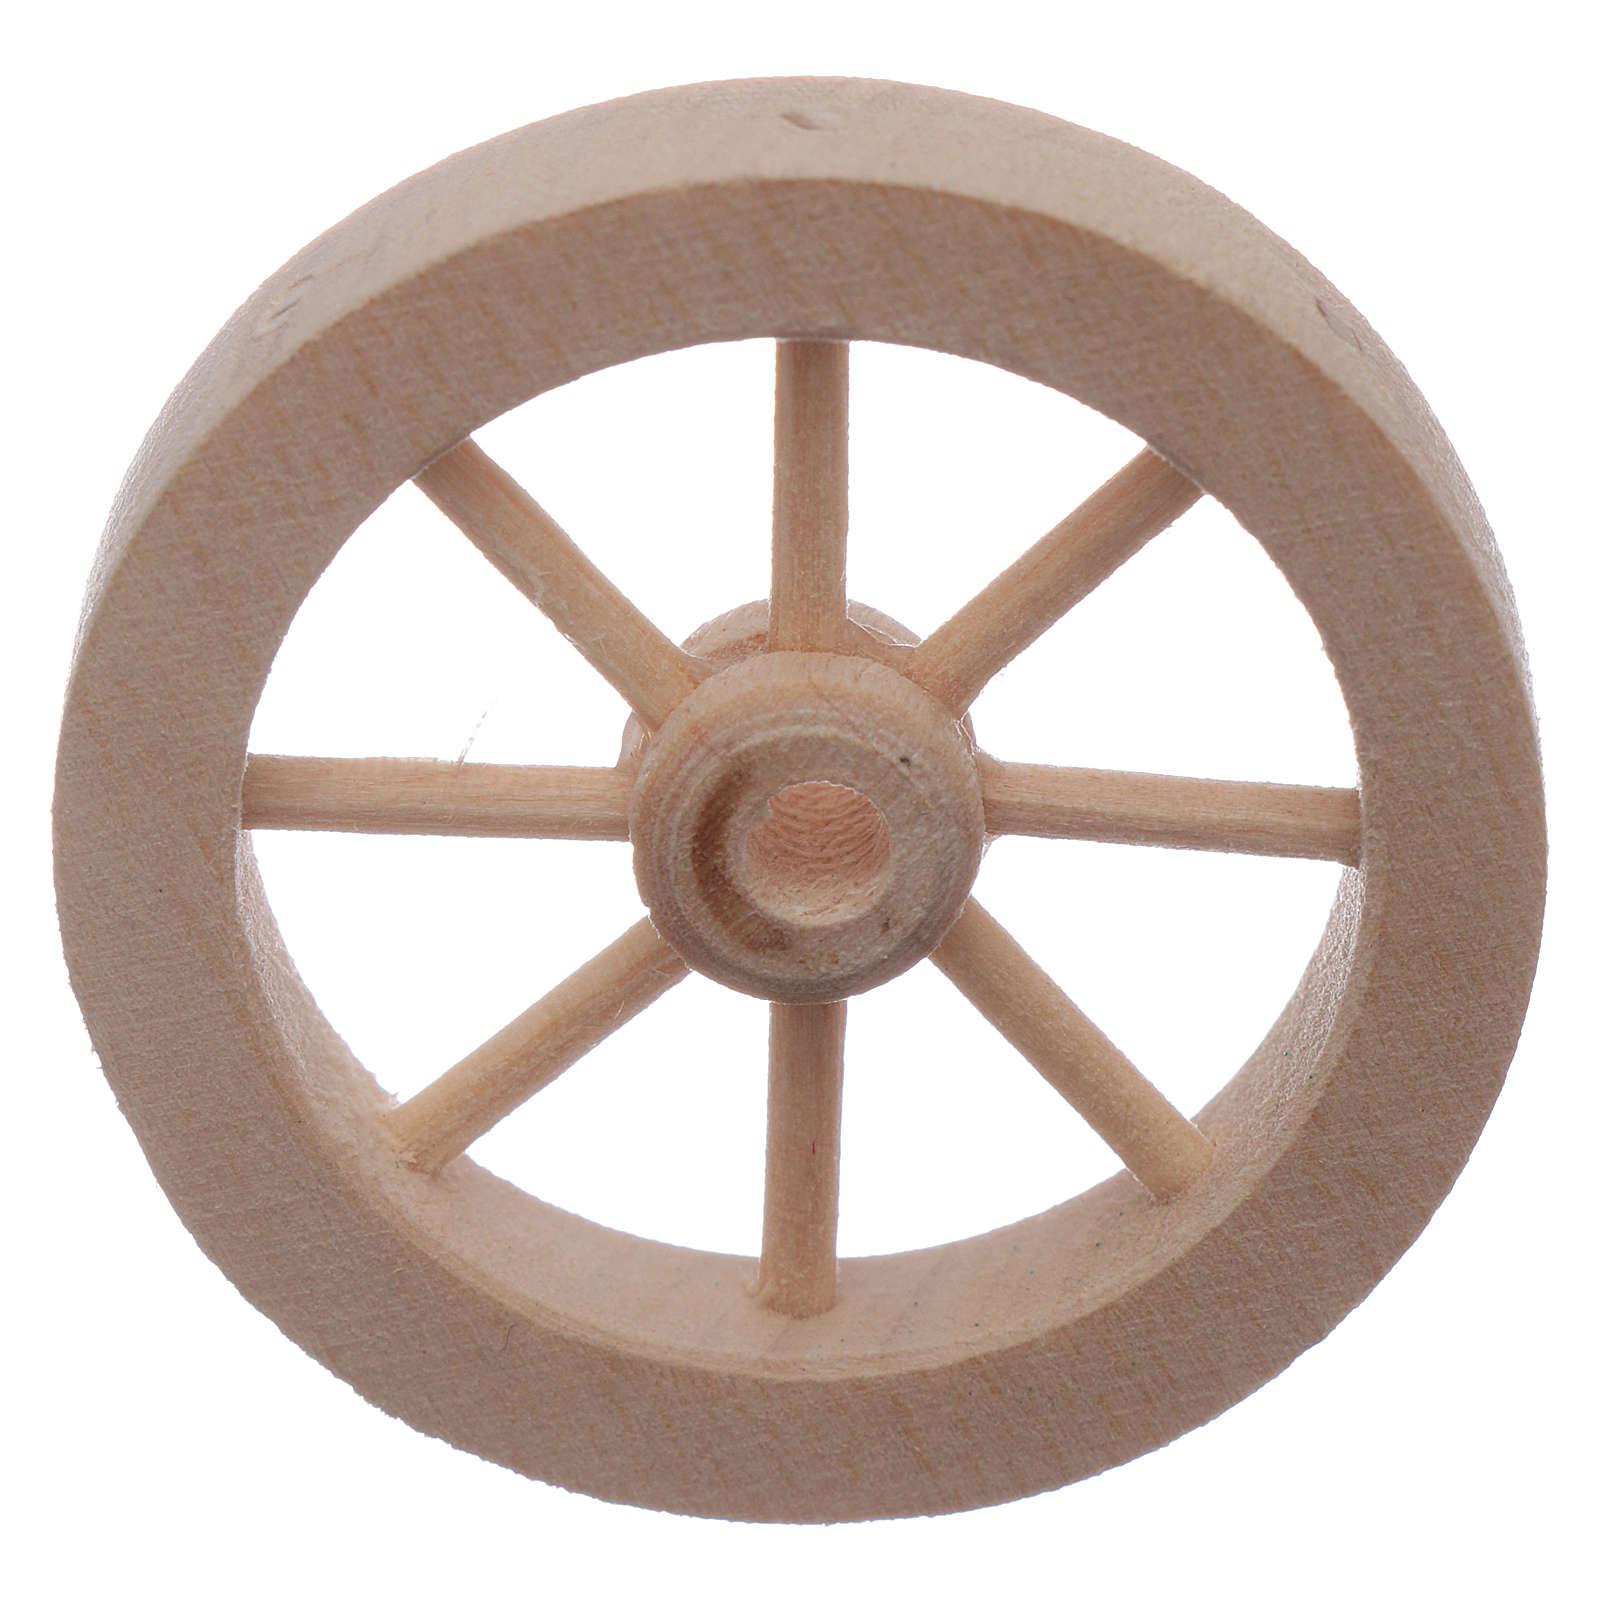 Rueda carro de madera belén diám. 4 cm 4